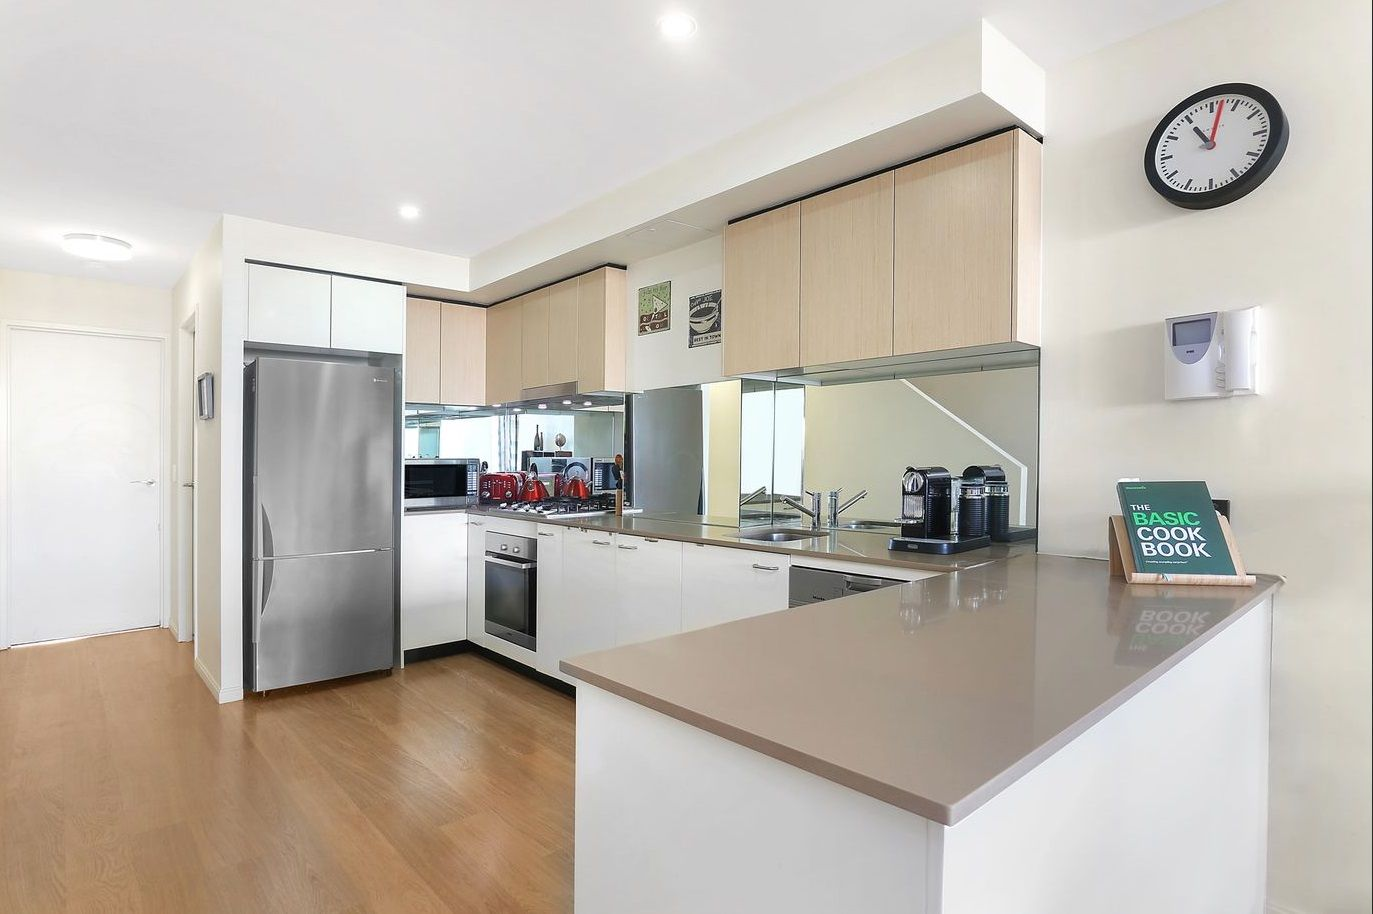 701/17 Gadigal Avenue - Garland 77, Zetland NSW 2017, Image 1